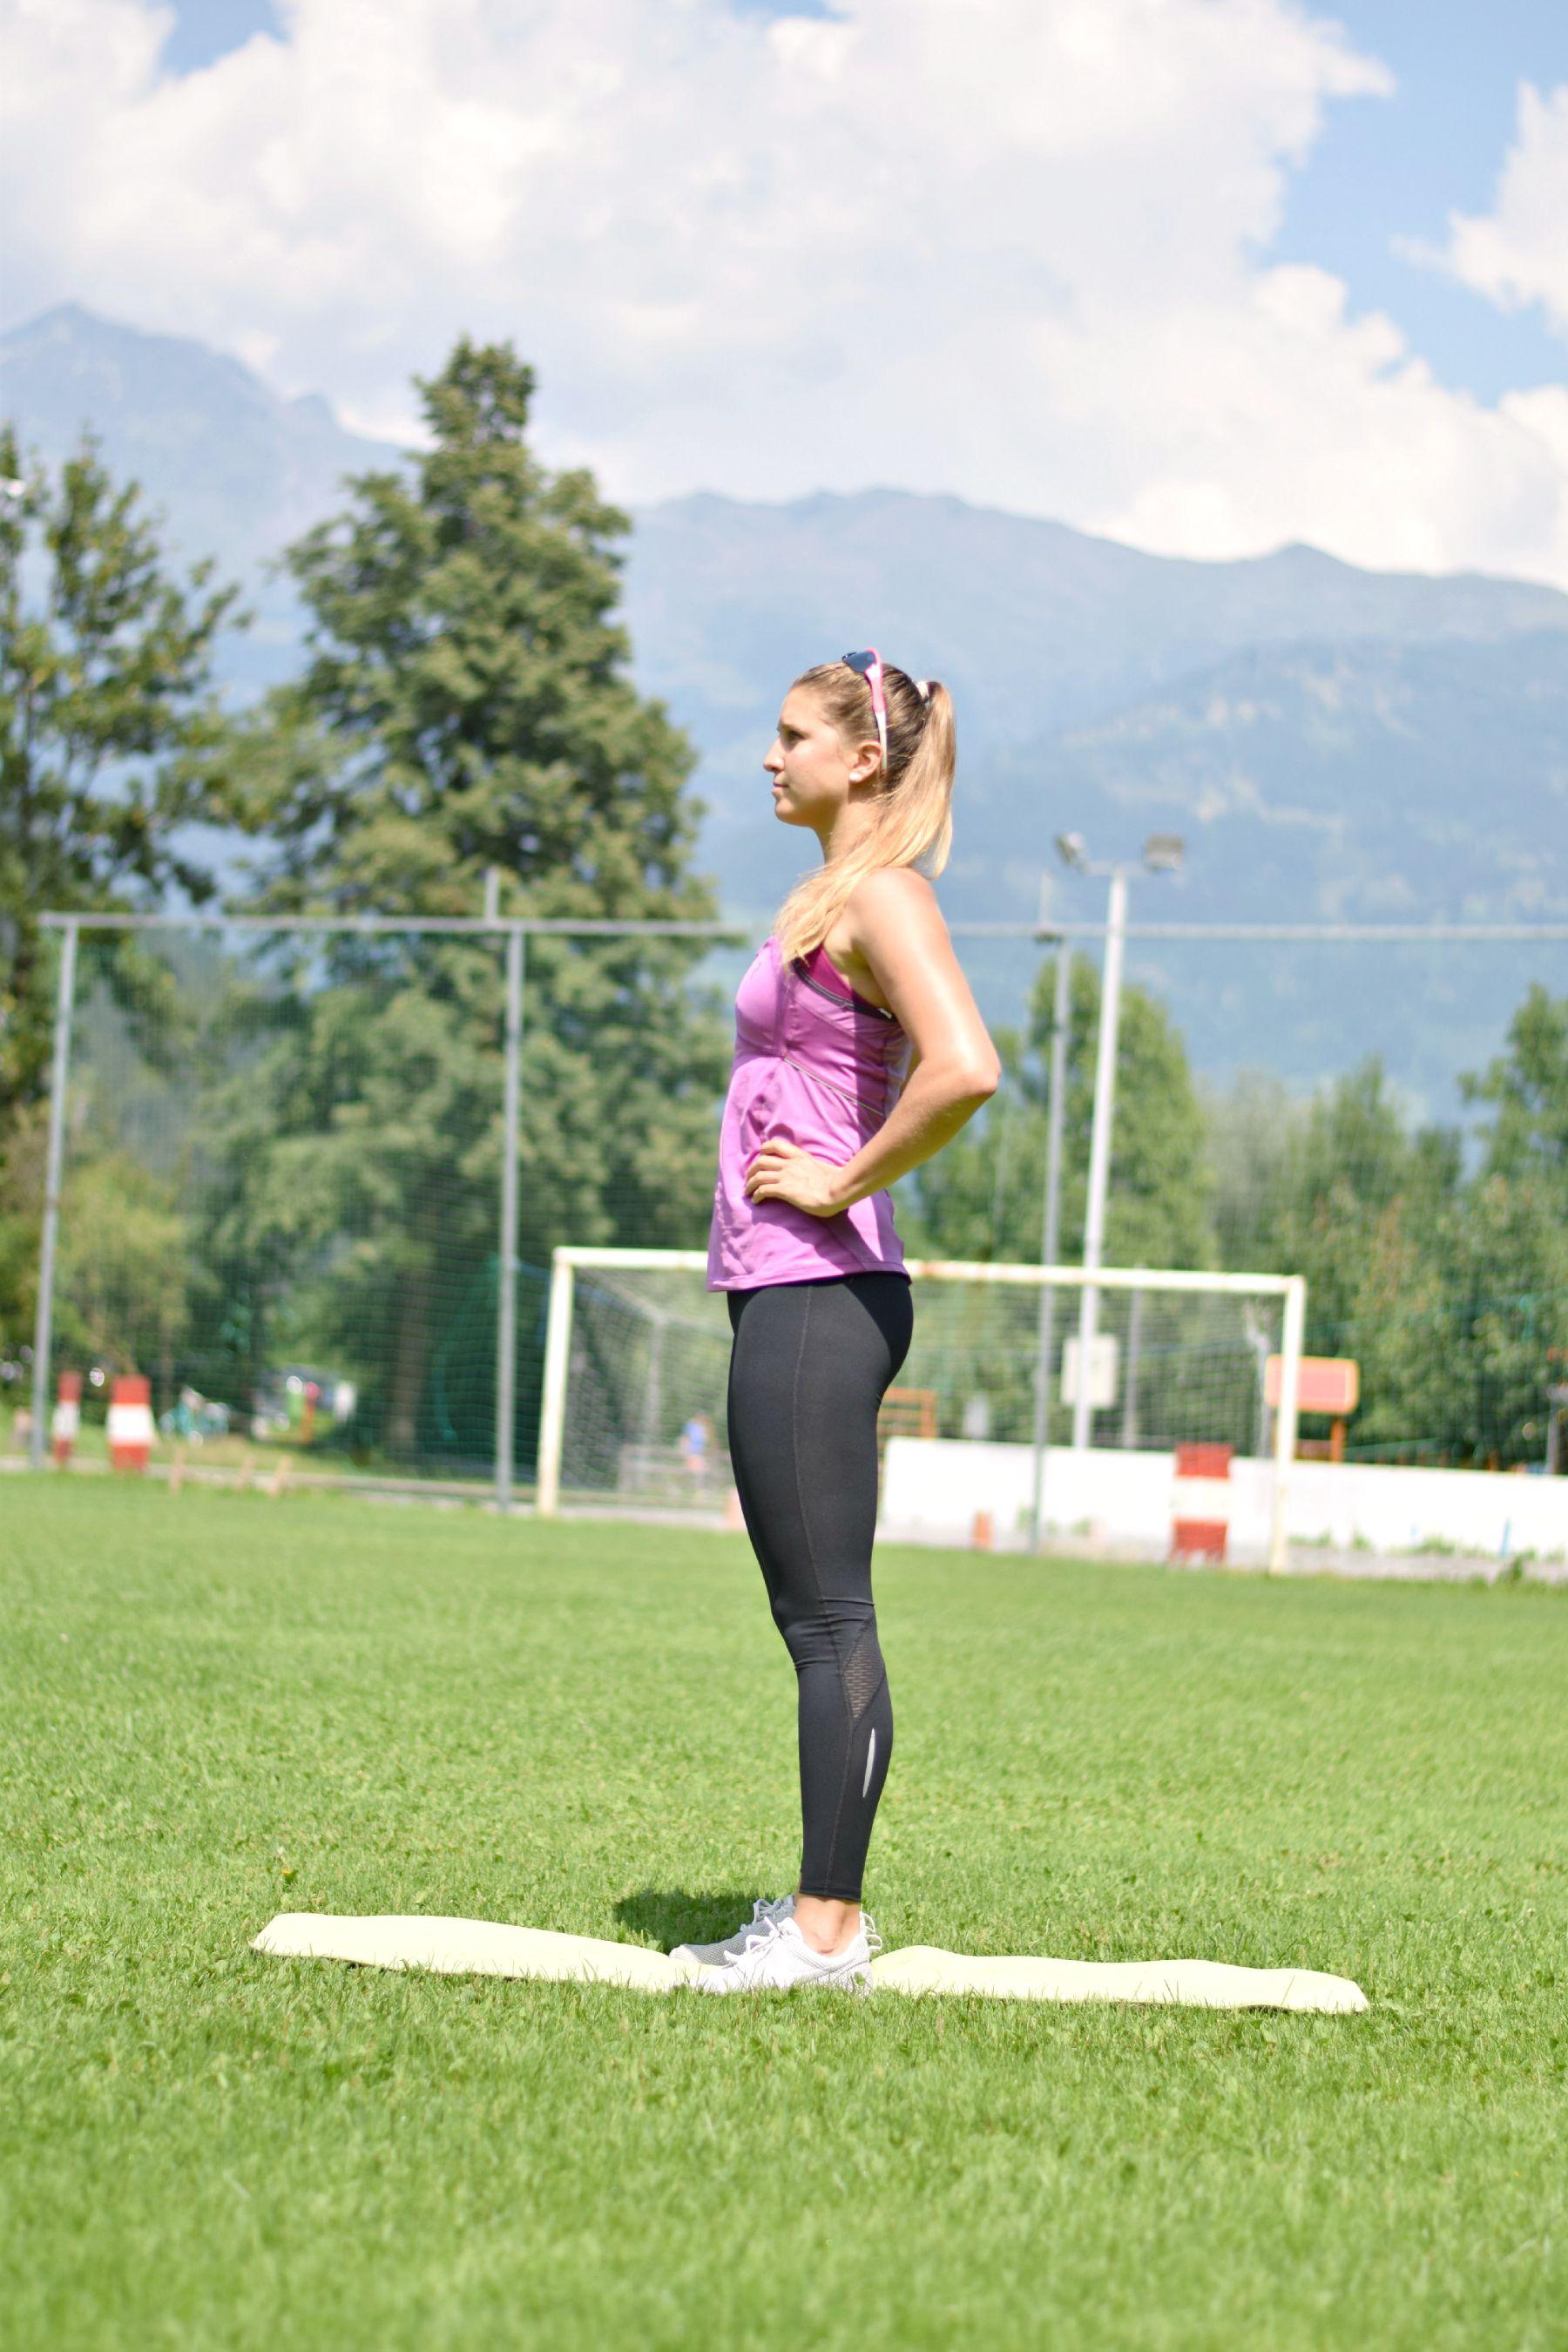 Tag 1 FIT: Home Workout - Beine & Po / HAPPY Self love - KlaraFuchs.com